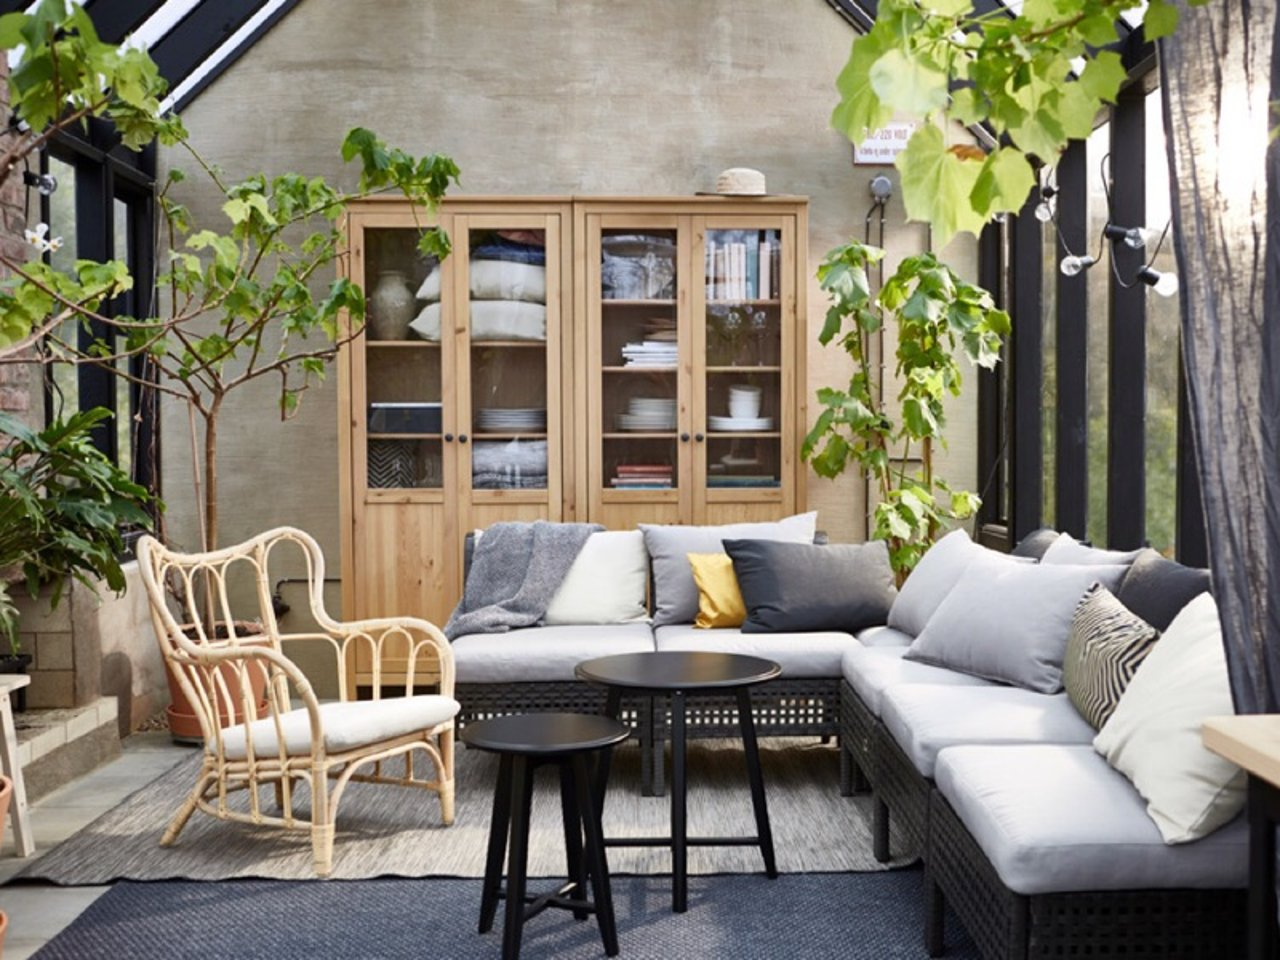 【IKEA】逛IKEA总是逛不腻:家具的多种用途+有趣物件